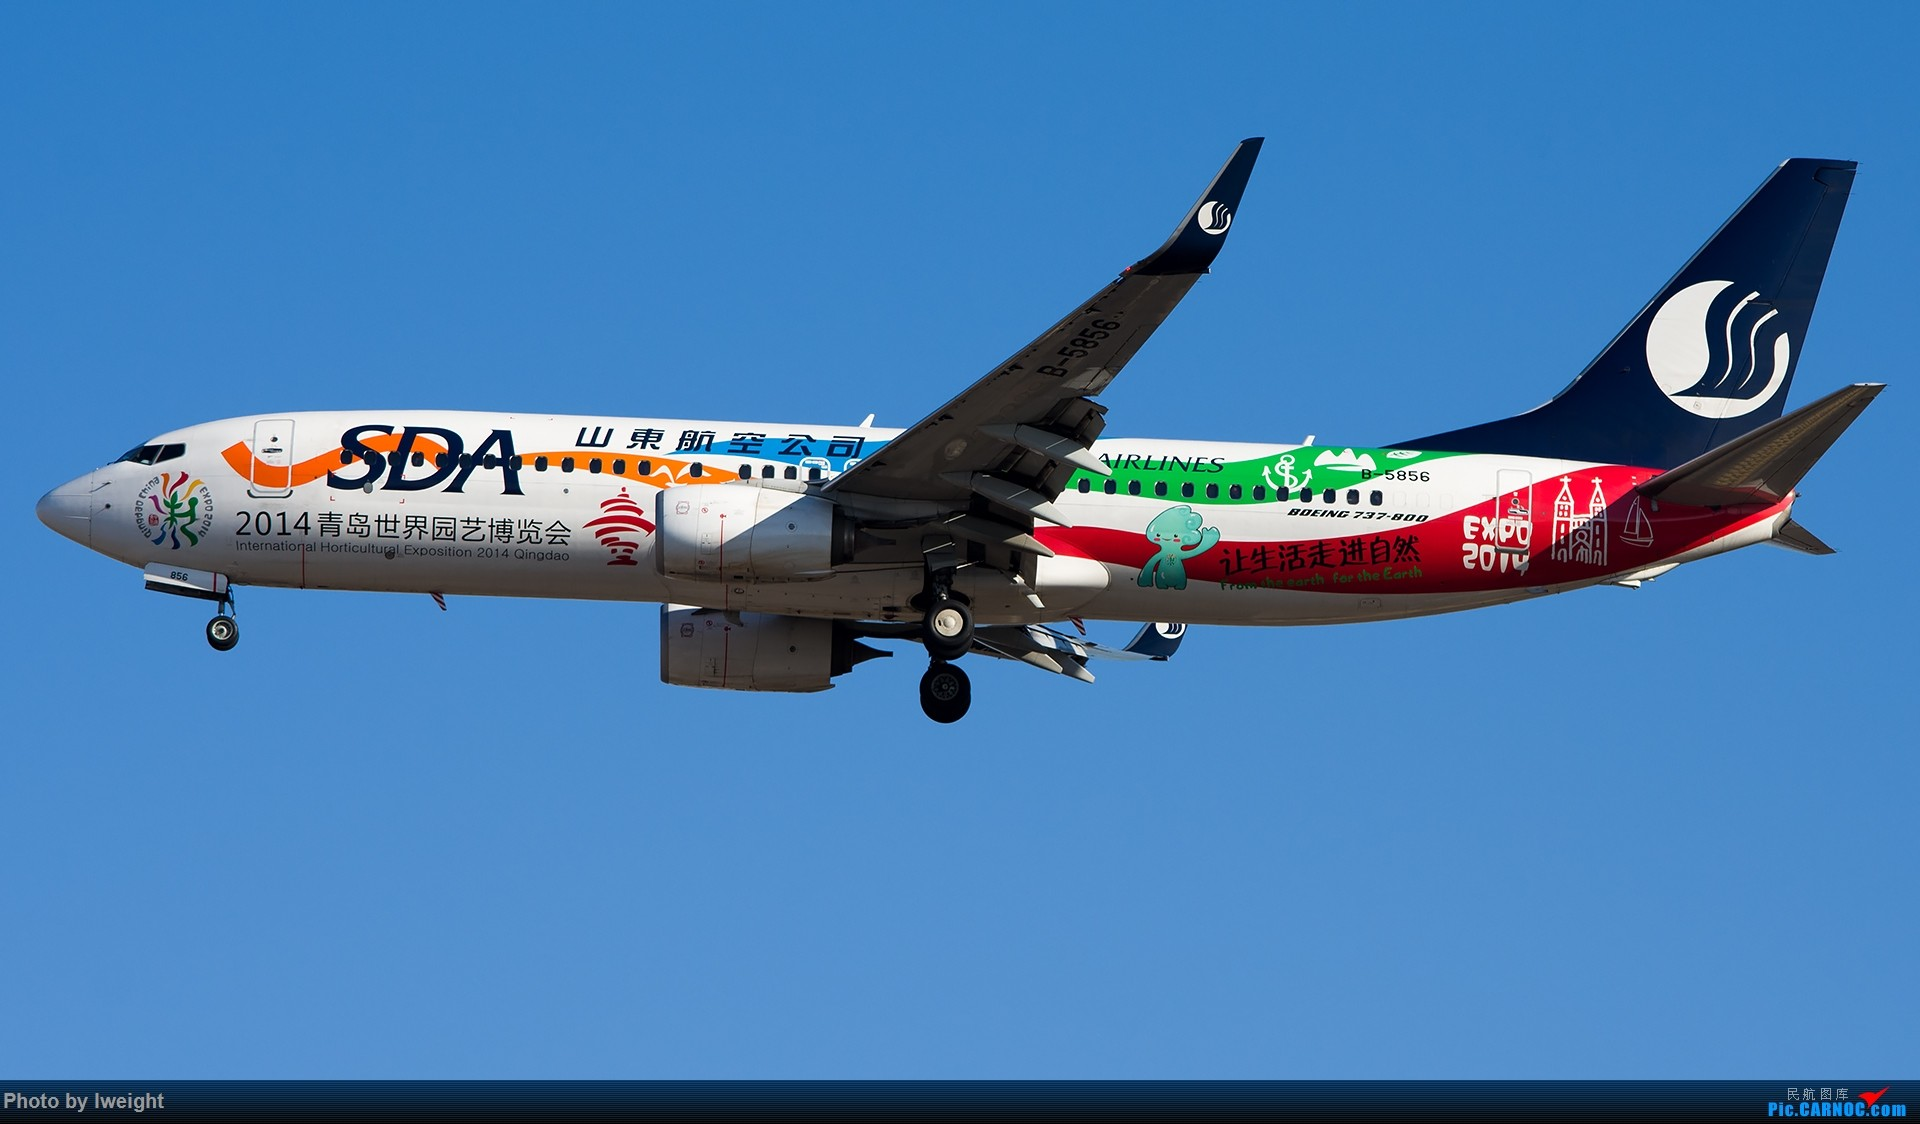 Re:[原创]终于在12月的北京等到了一个晴天的周末,出来拍拍飞机【2015-12-5】 BOEING 737-800 B-5856 中国北京首都国际机场